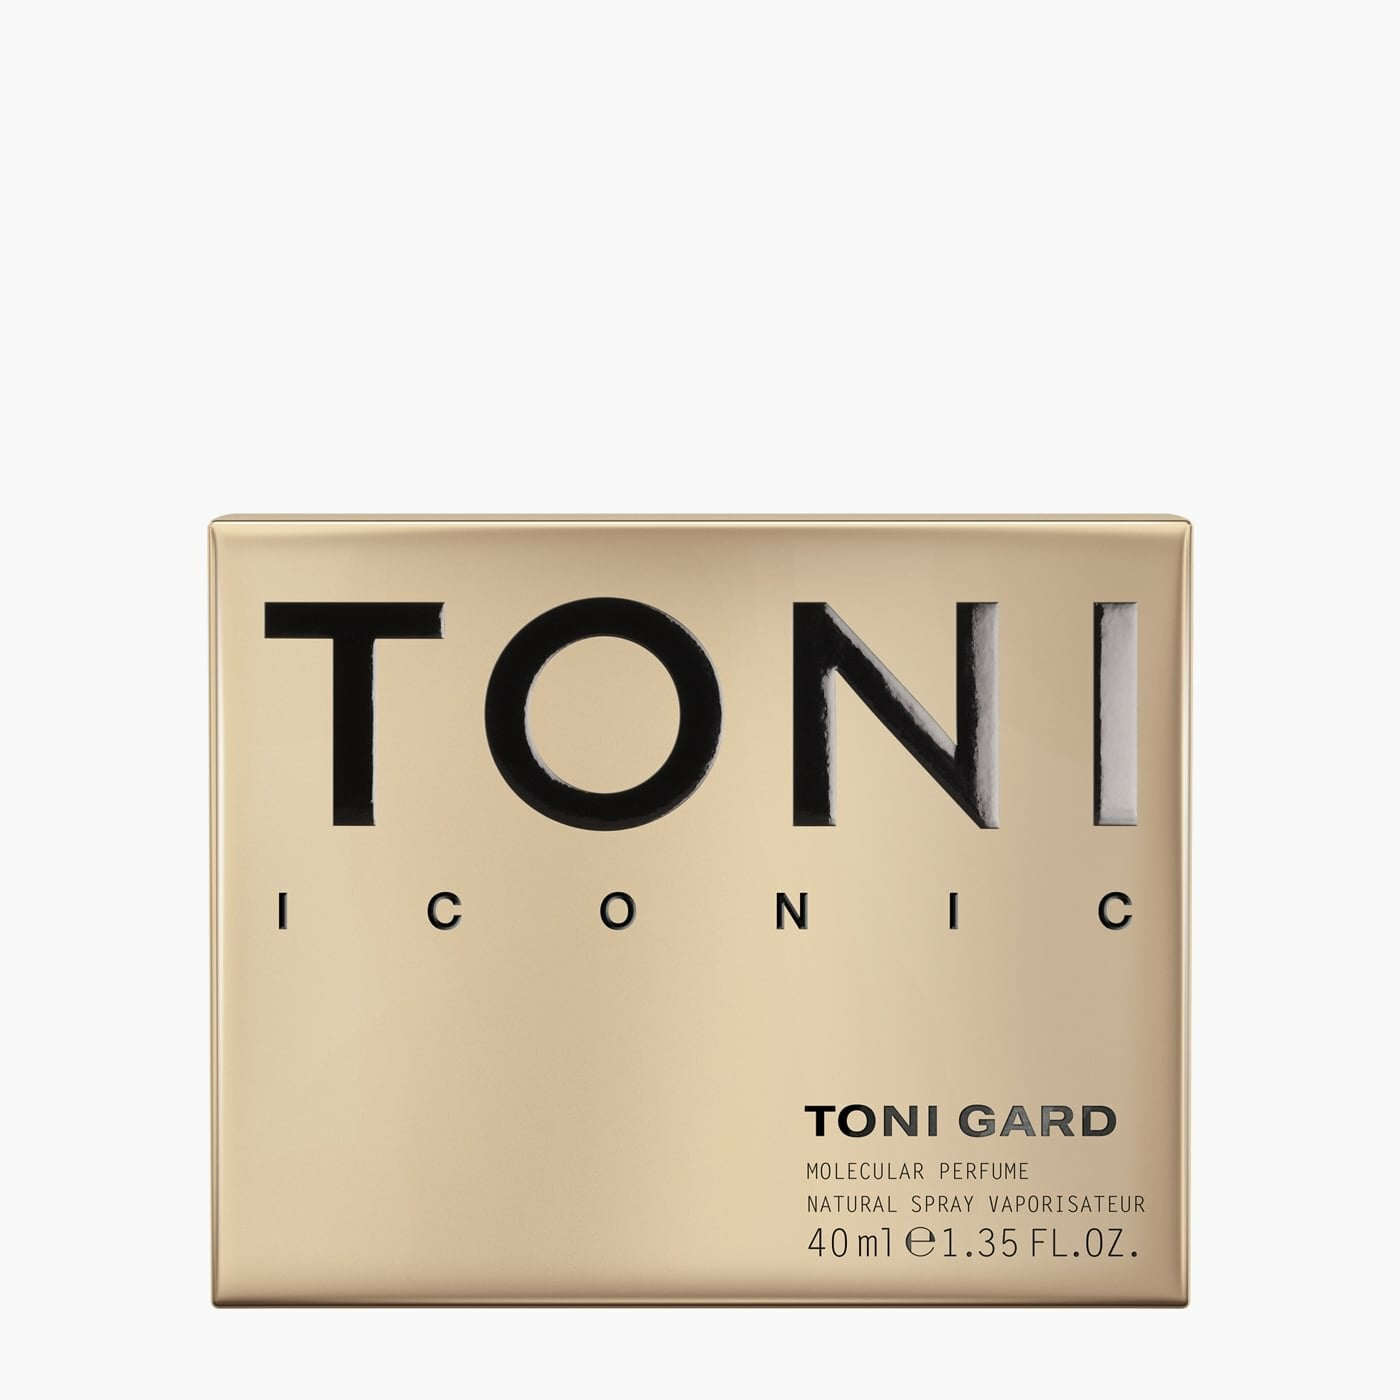 TONI ICONIC FOR WOMAN Moleculare Parfum / 40 ML